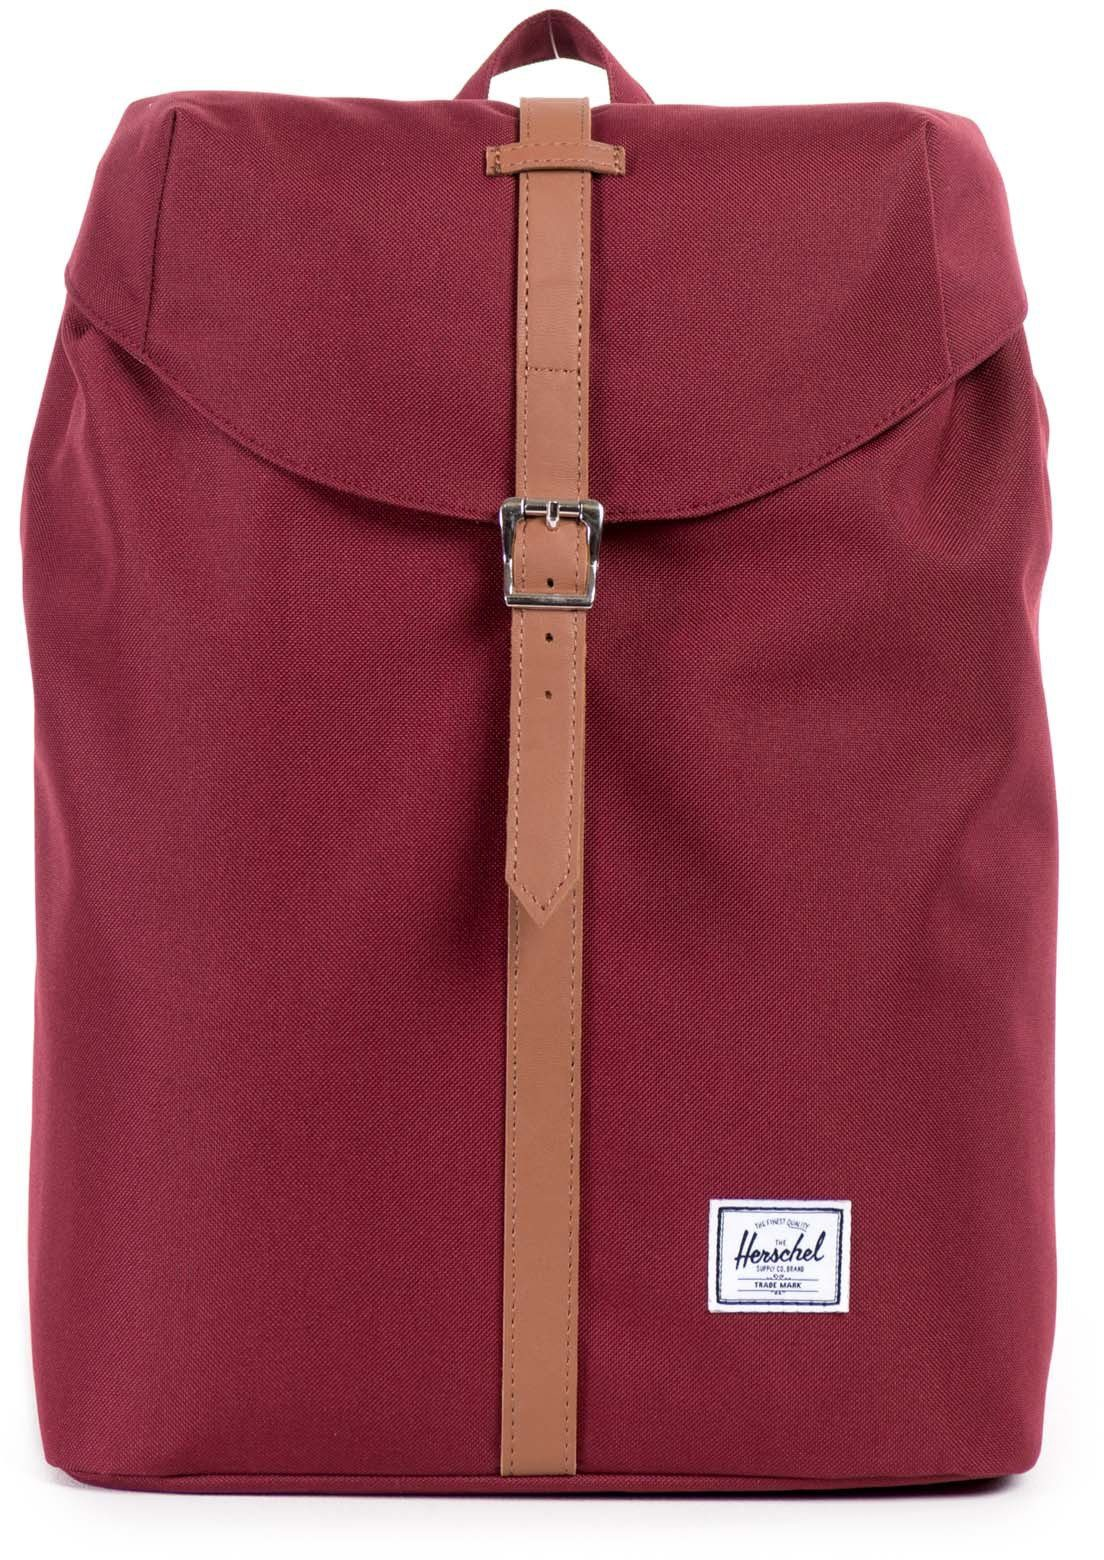 Herschel Rucksack mit Laptopfach, »Post Backpack, Windsor Wine, Mid Volume«